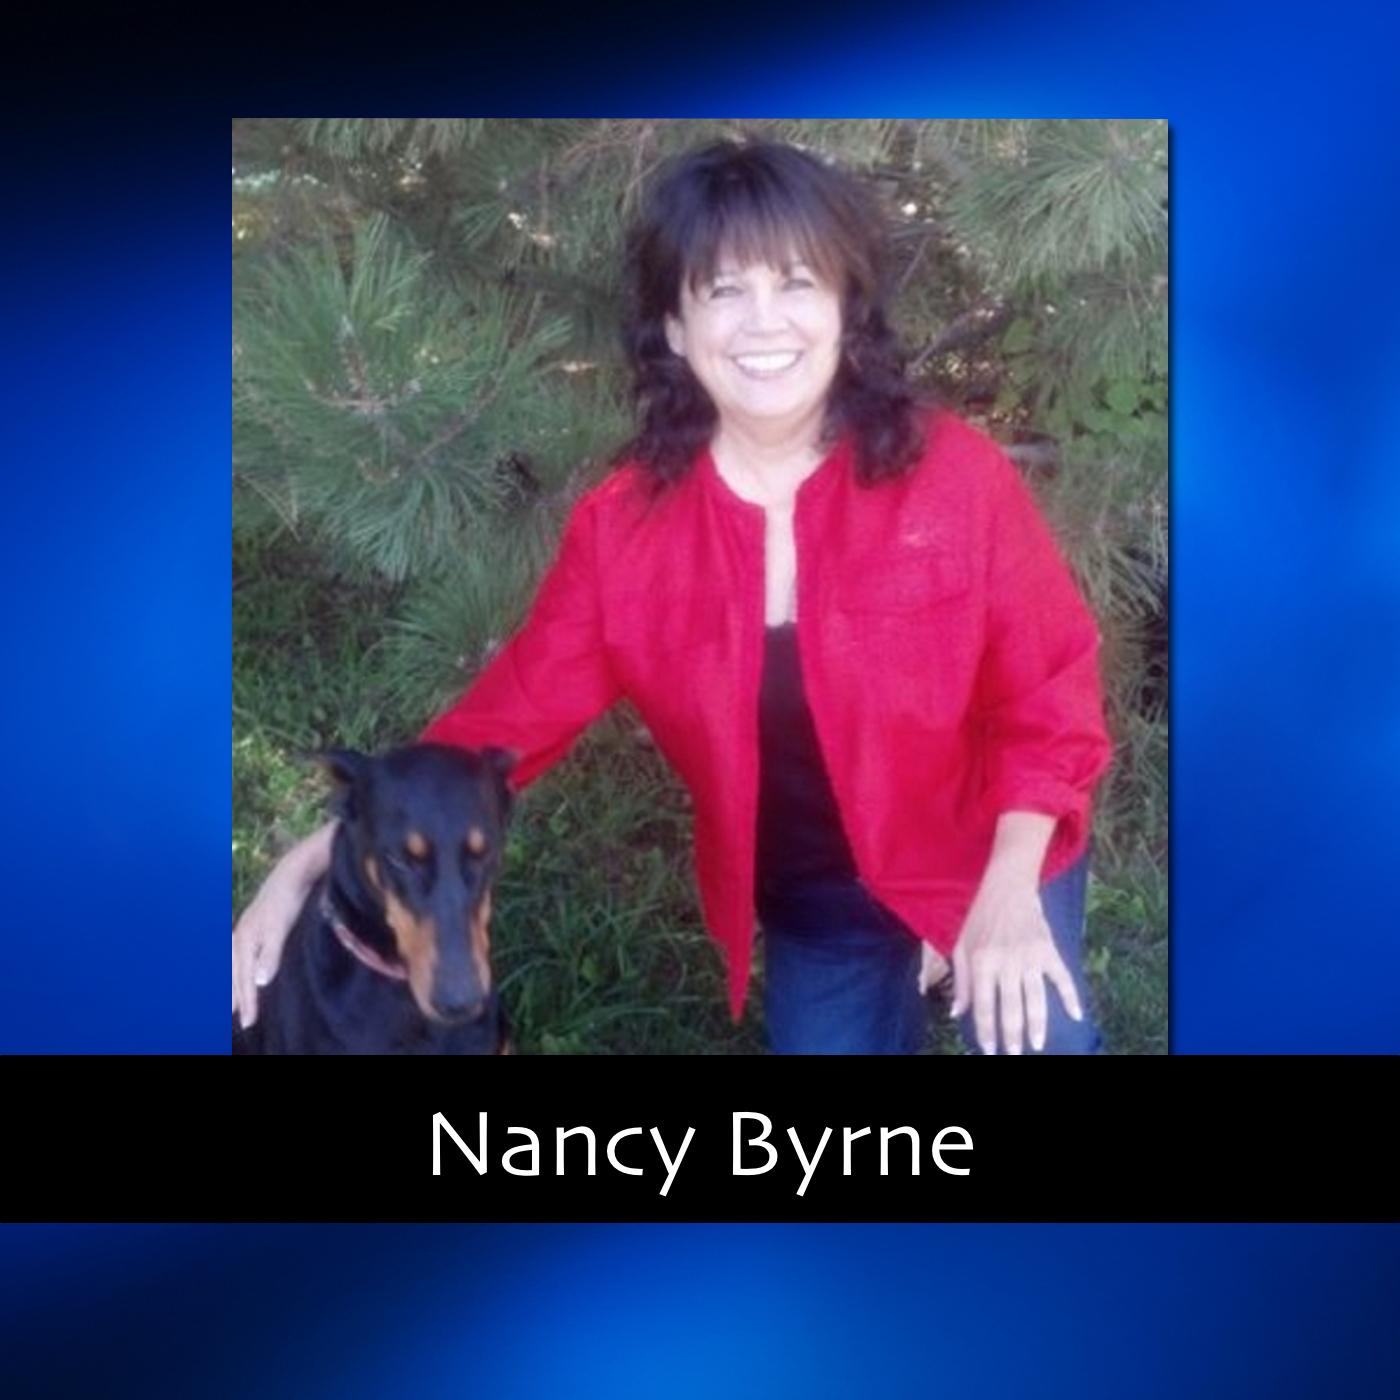 Nancy Byrne Thumb.jpg